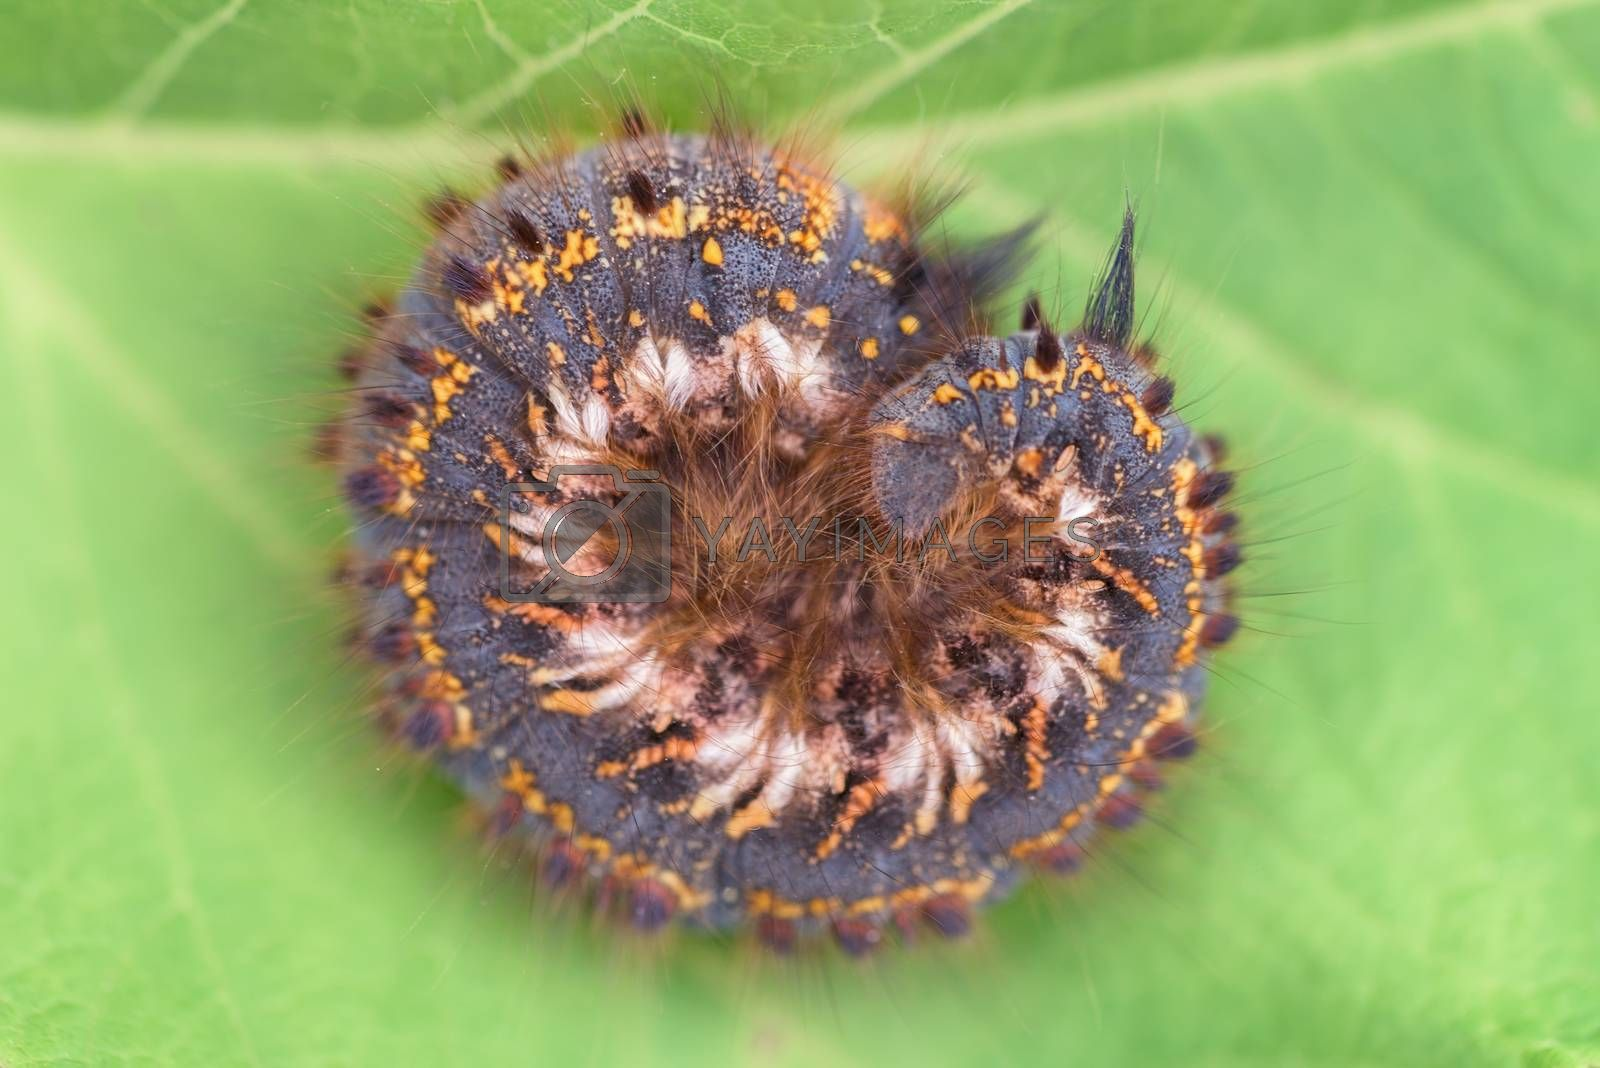 Caterpillar on leaf. Caterpillar on green background